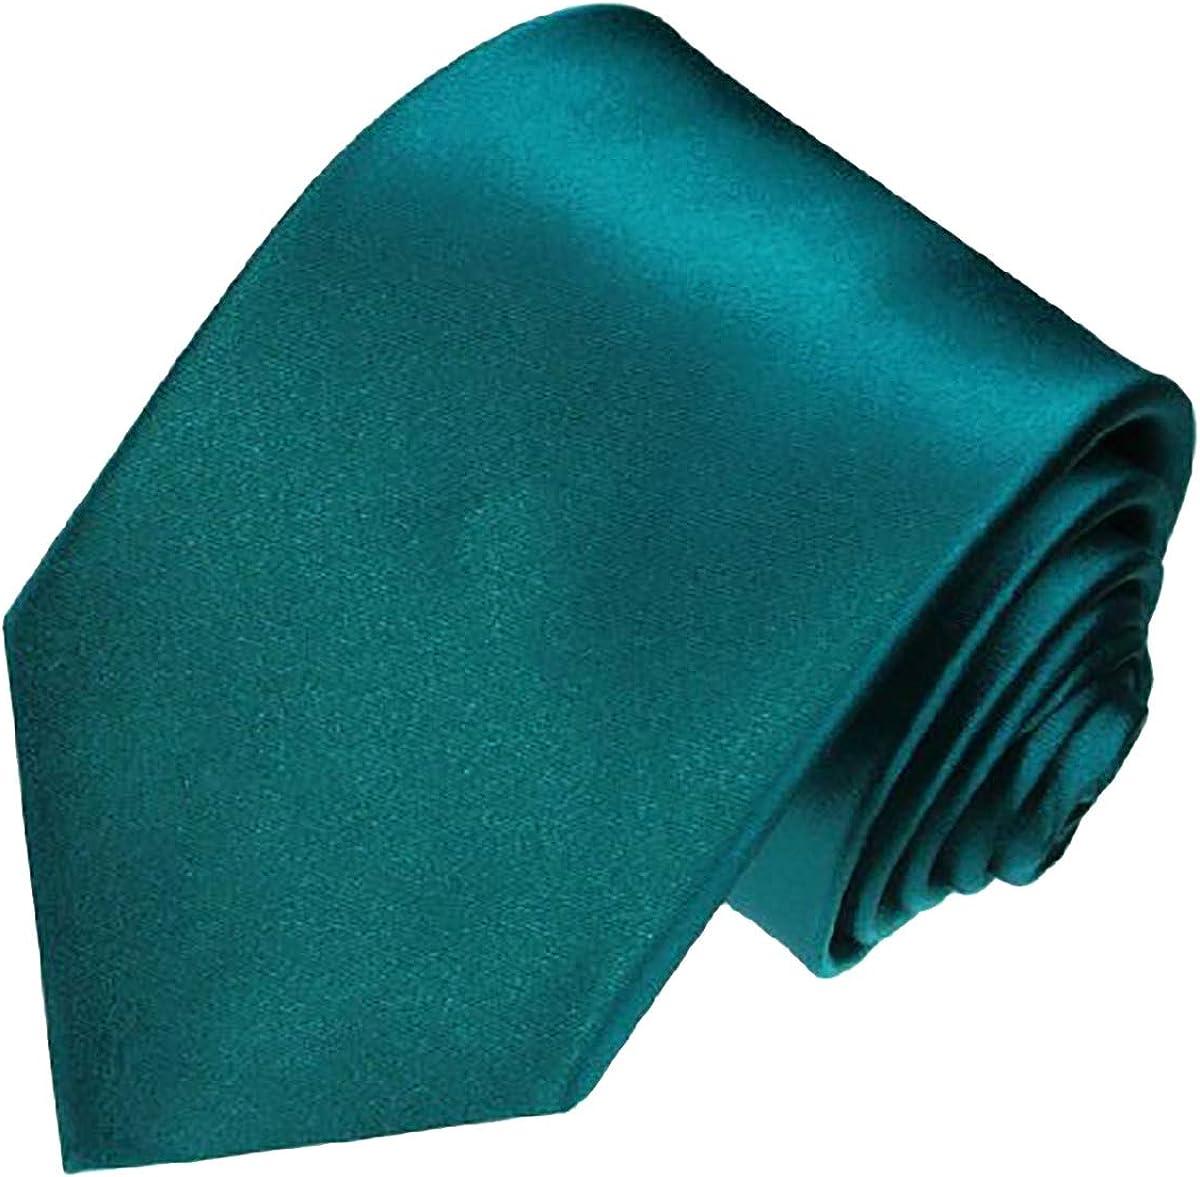 gift LORENZO CANA Dallas Mall - Luxury Italian 100% Pure Handmade Silk Tie Woven